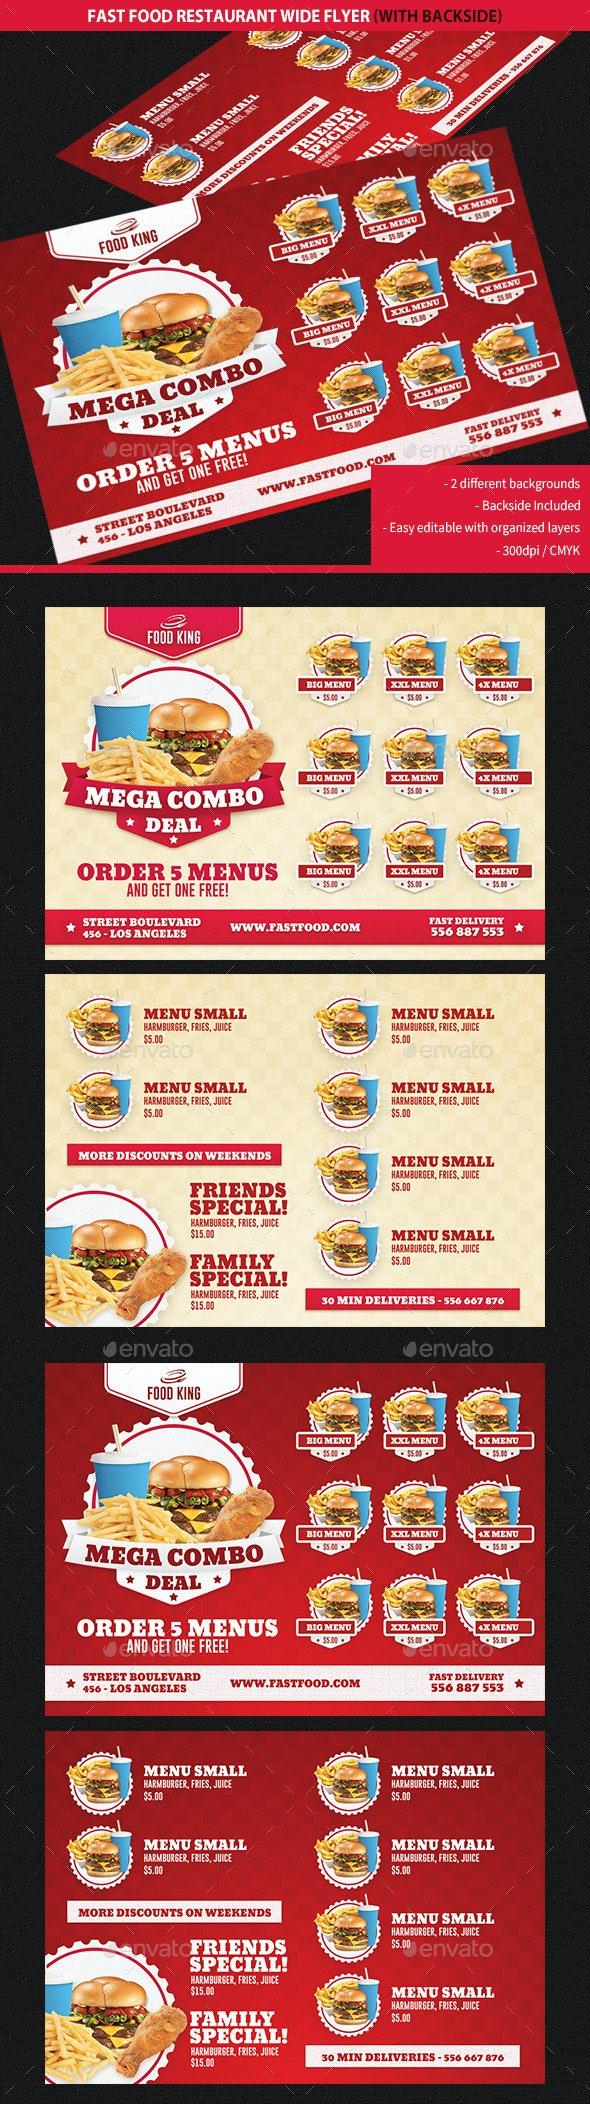 Restaurant Fast Food Promotions Wide Flyer - Restaurant Flyers